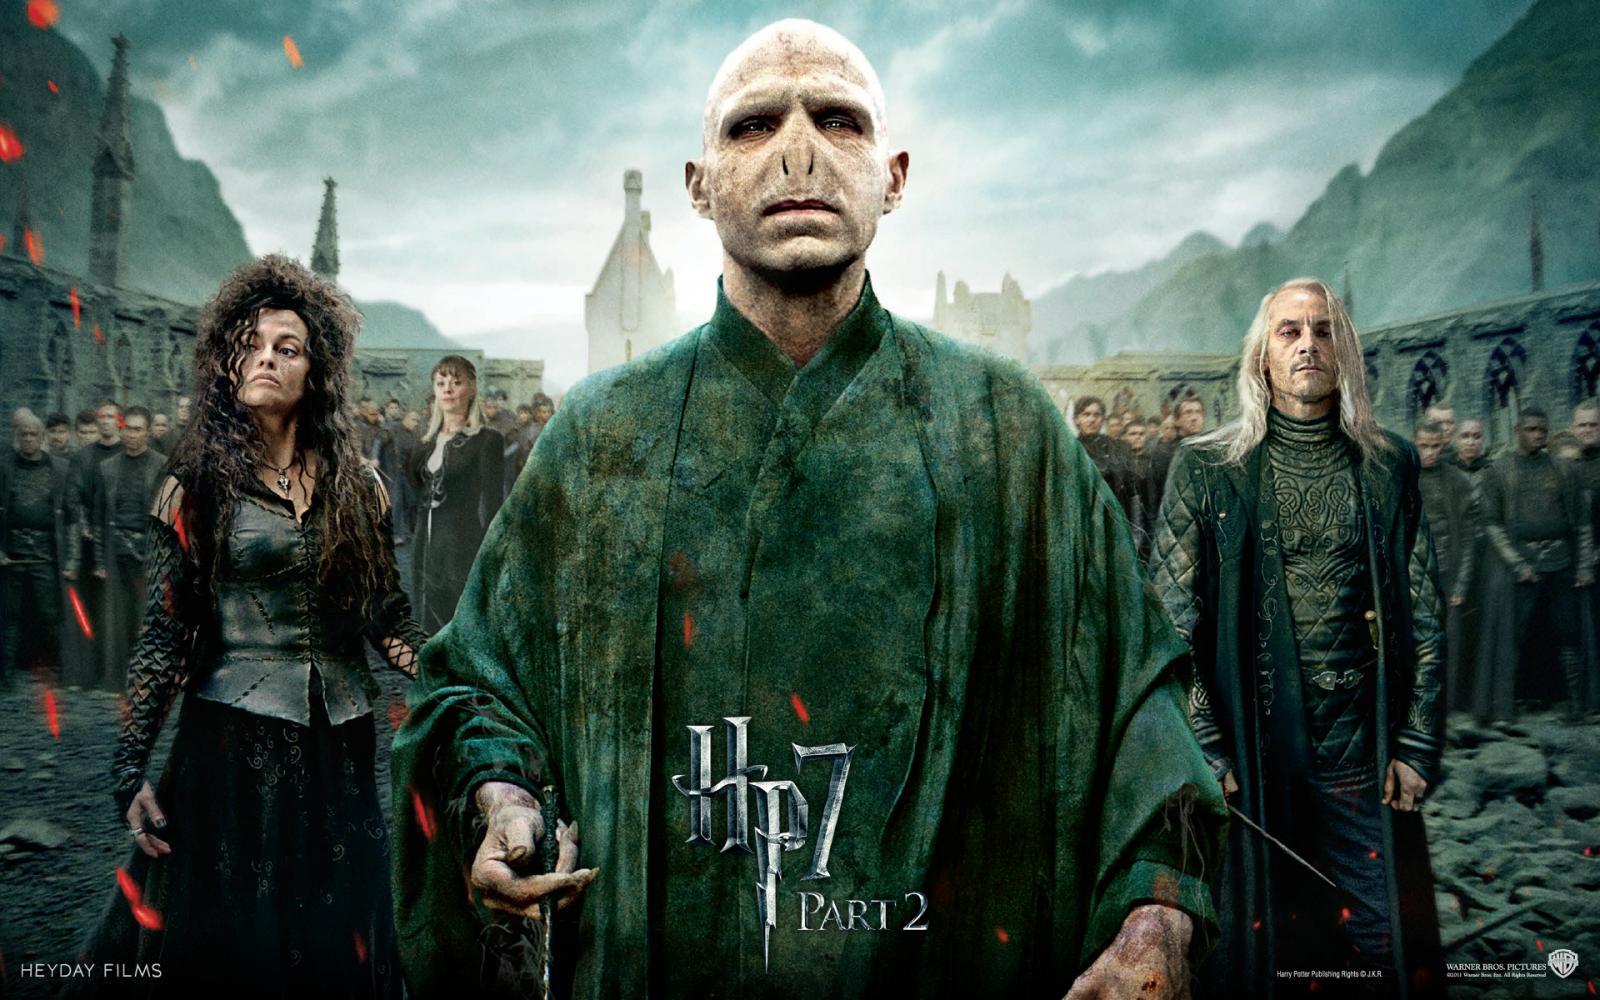 Wallpaper Harry Potter HP7 Draco Trio des forces du Mal - Bellatrix - Voldemort - Lucius